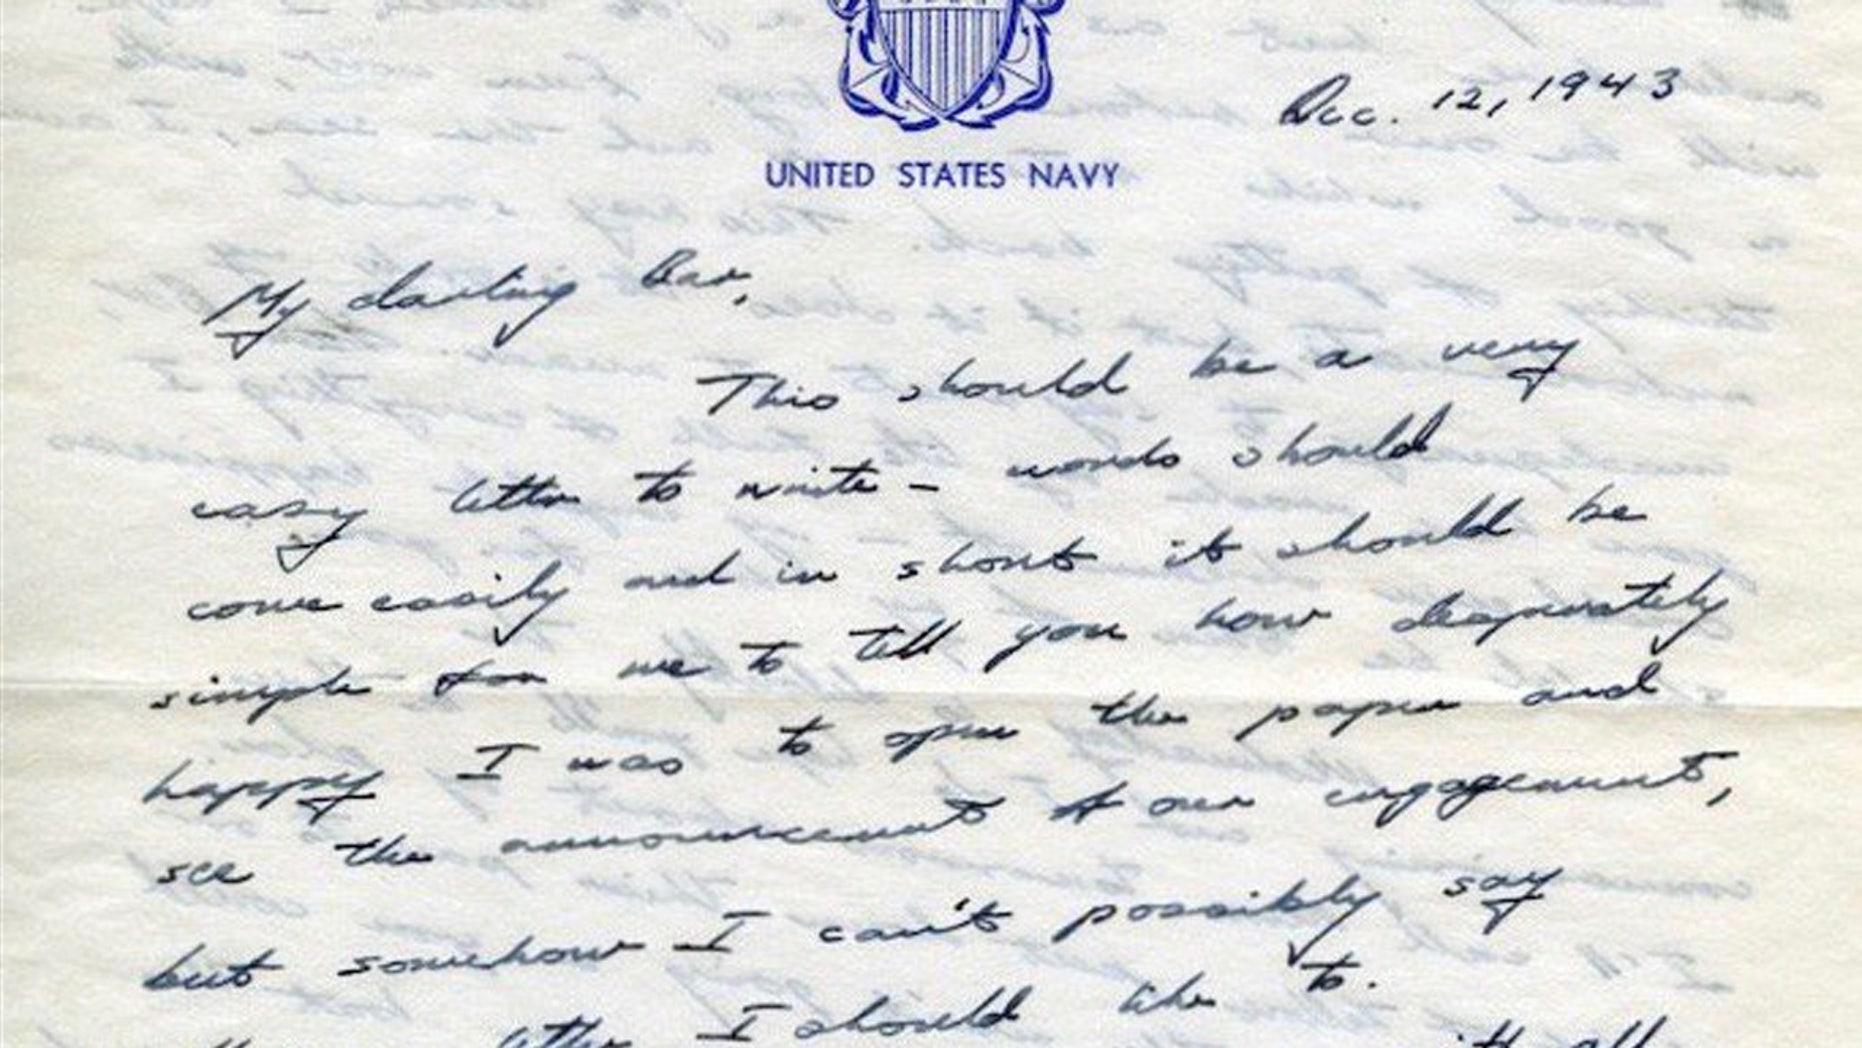 Former President George H.W. Bush sent Barbara a love letter that she kept in her scrapbook.